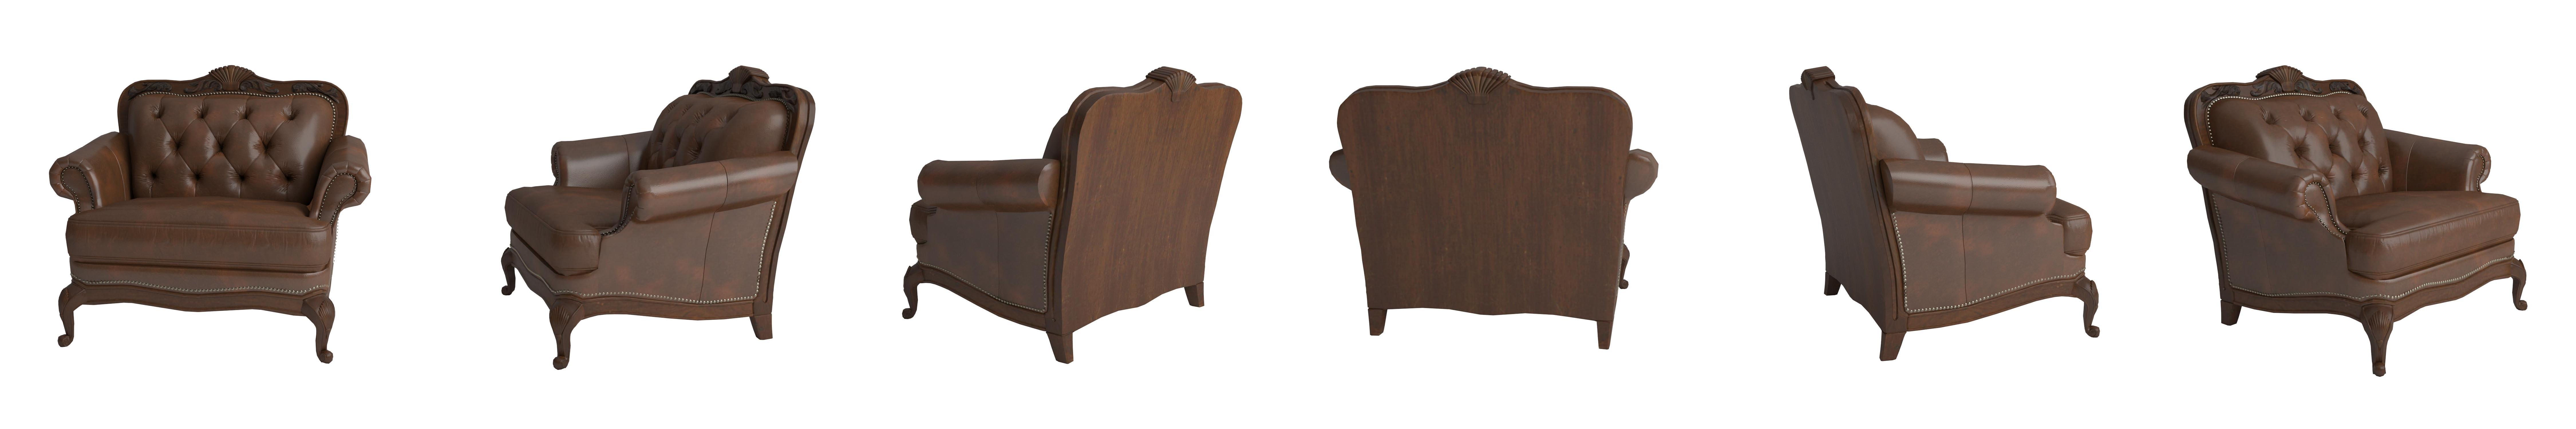 Amazon Chair Button Tufted Nail Head Trim Tri Tone Leather